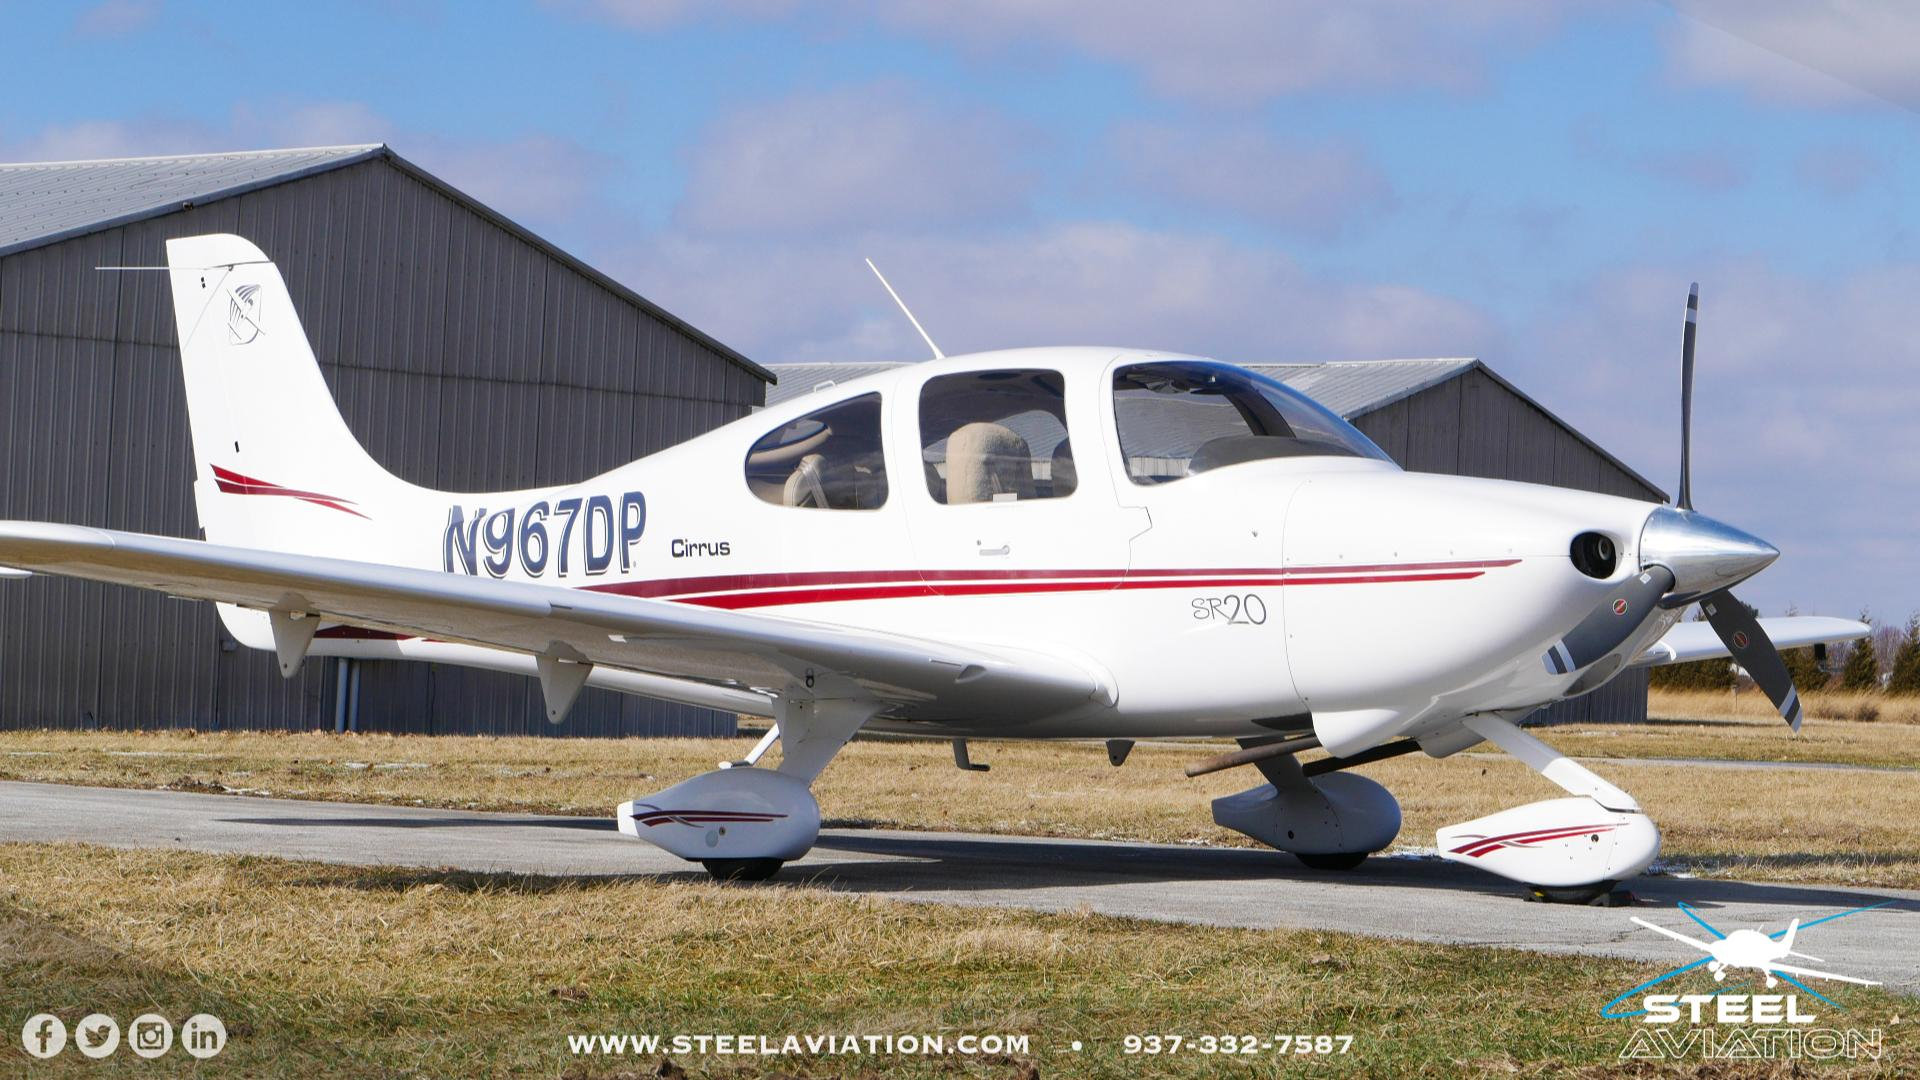 2002 Cirrus SR-20   Steel Aviation